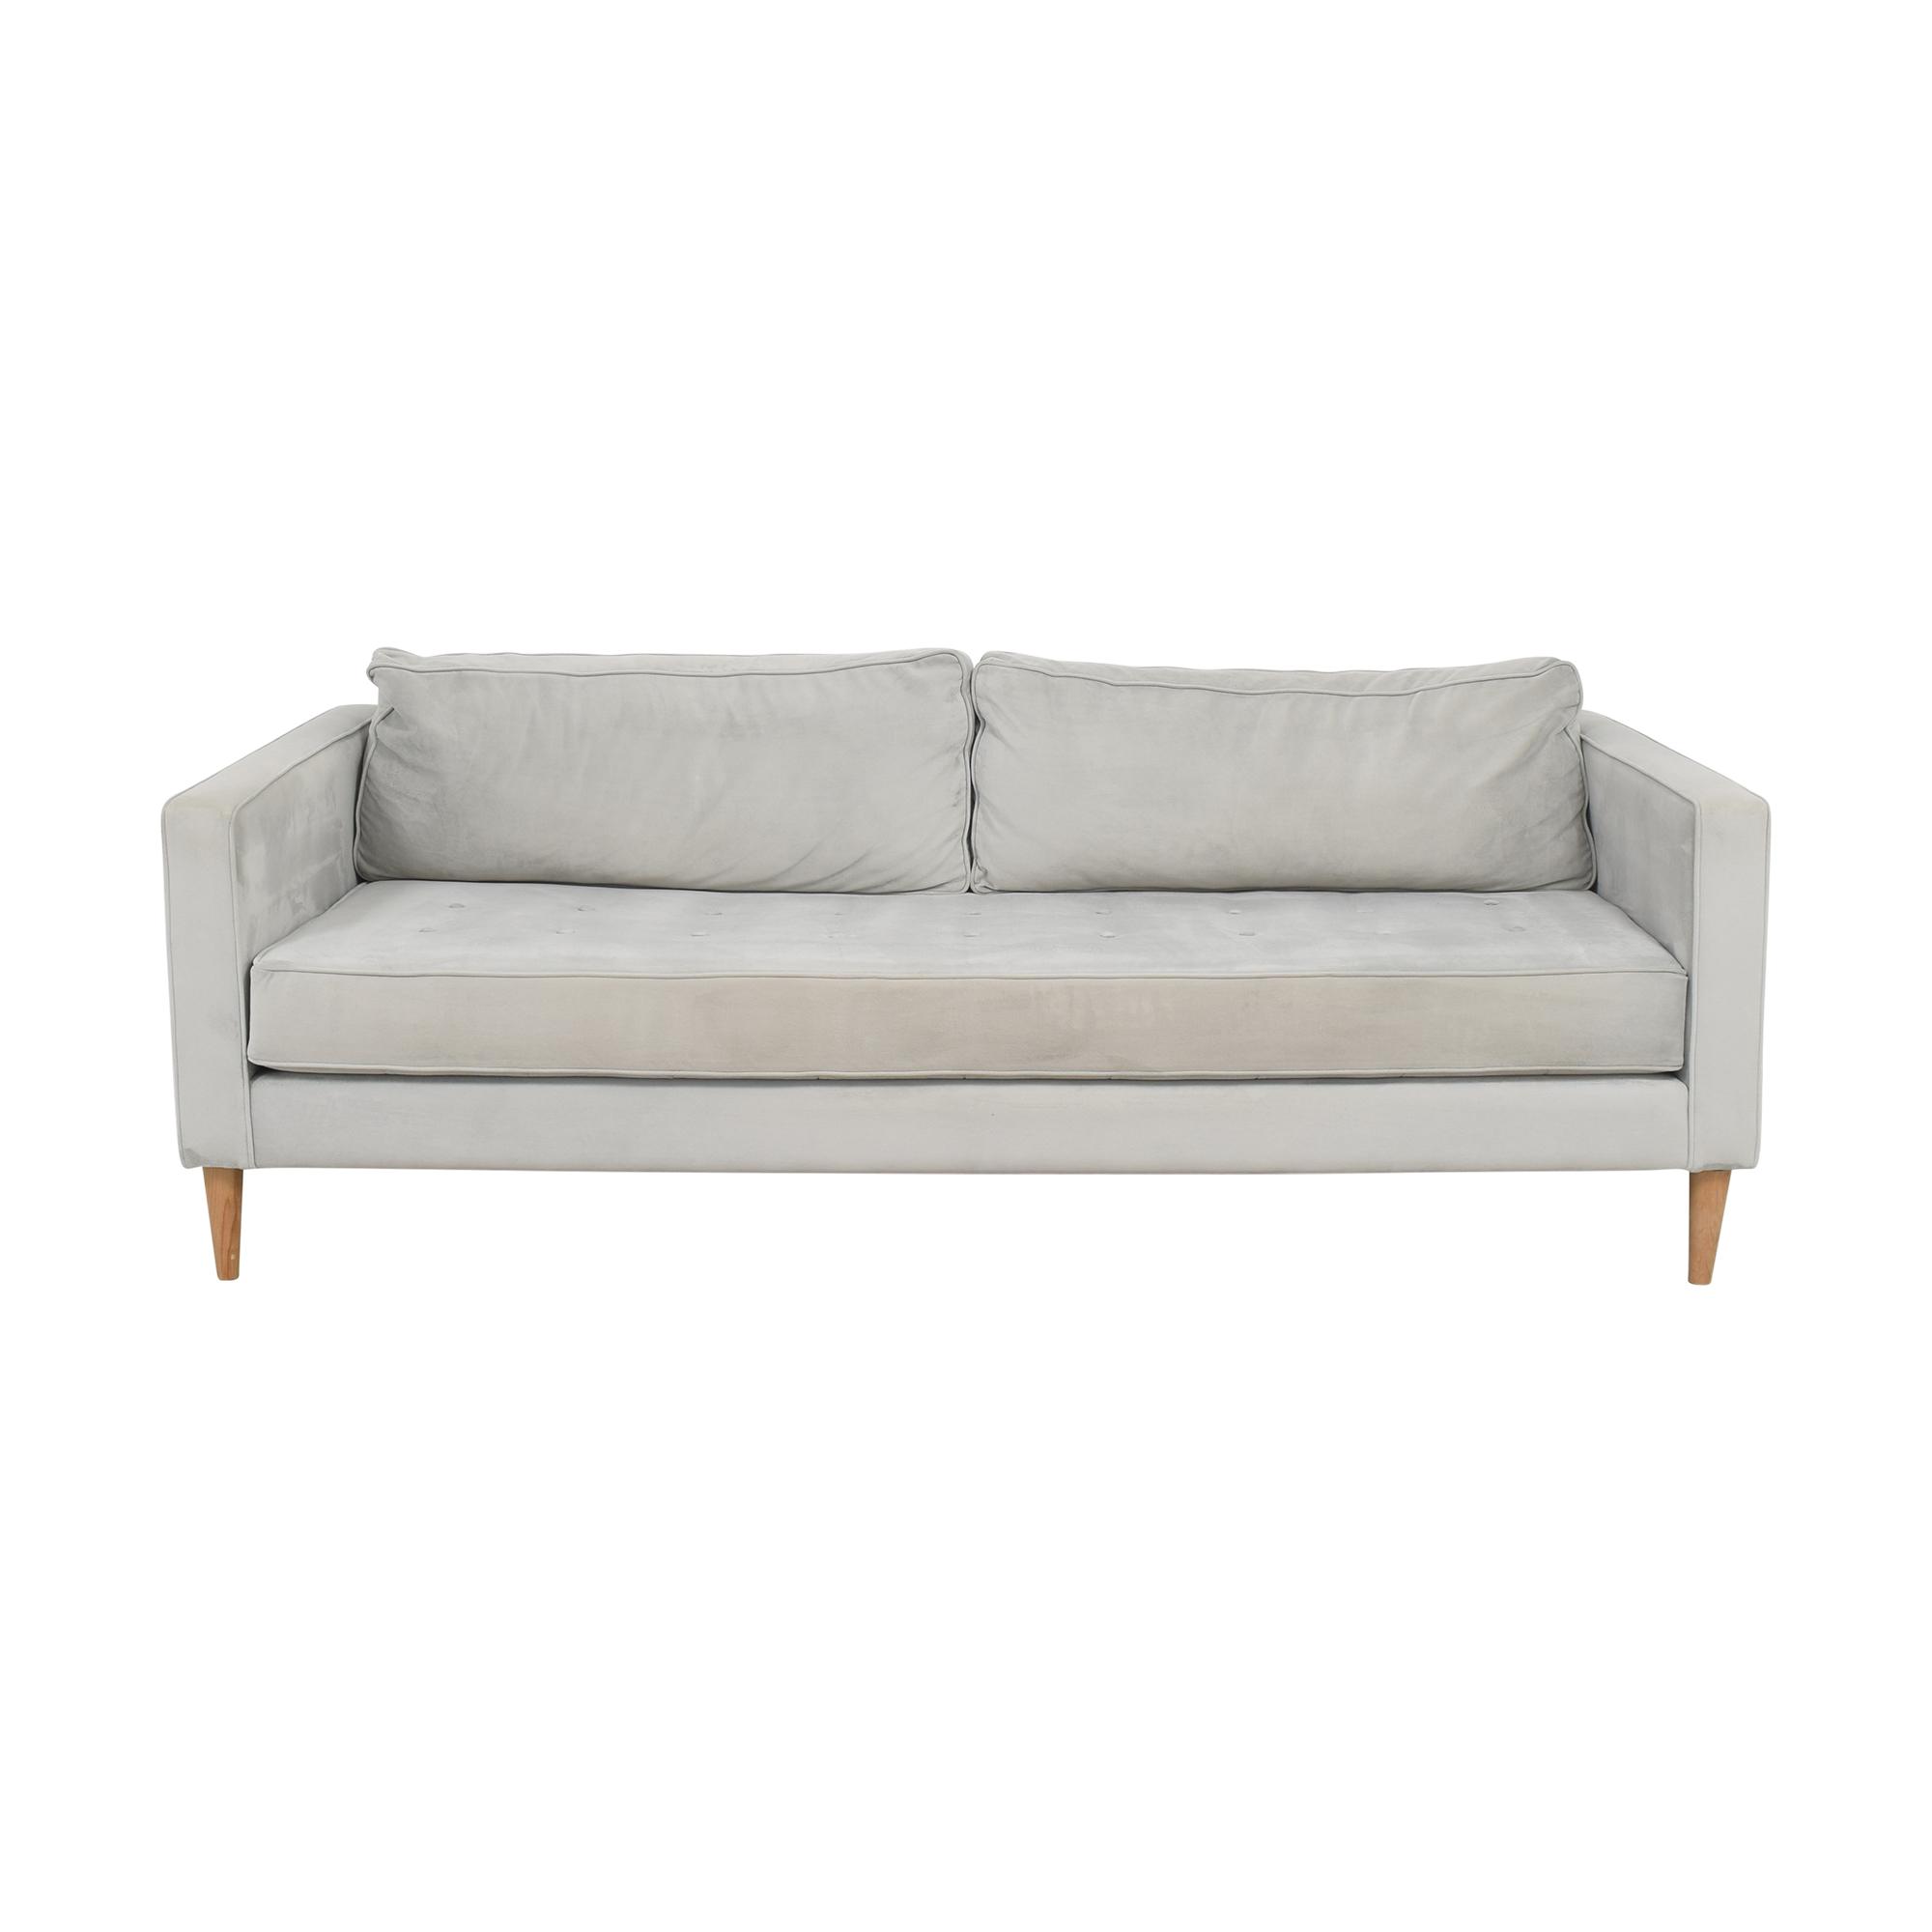 shop Apt2B Apt2B Delilah Sofa online